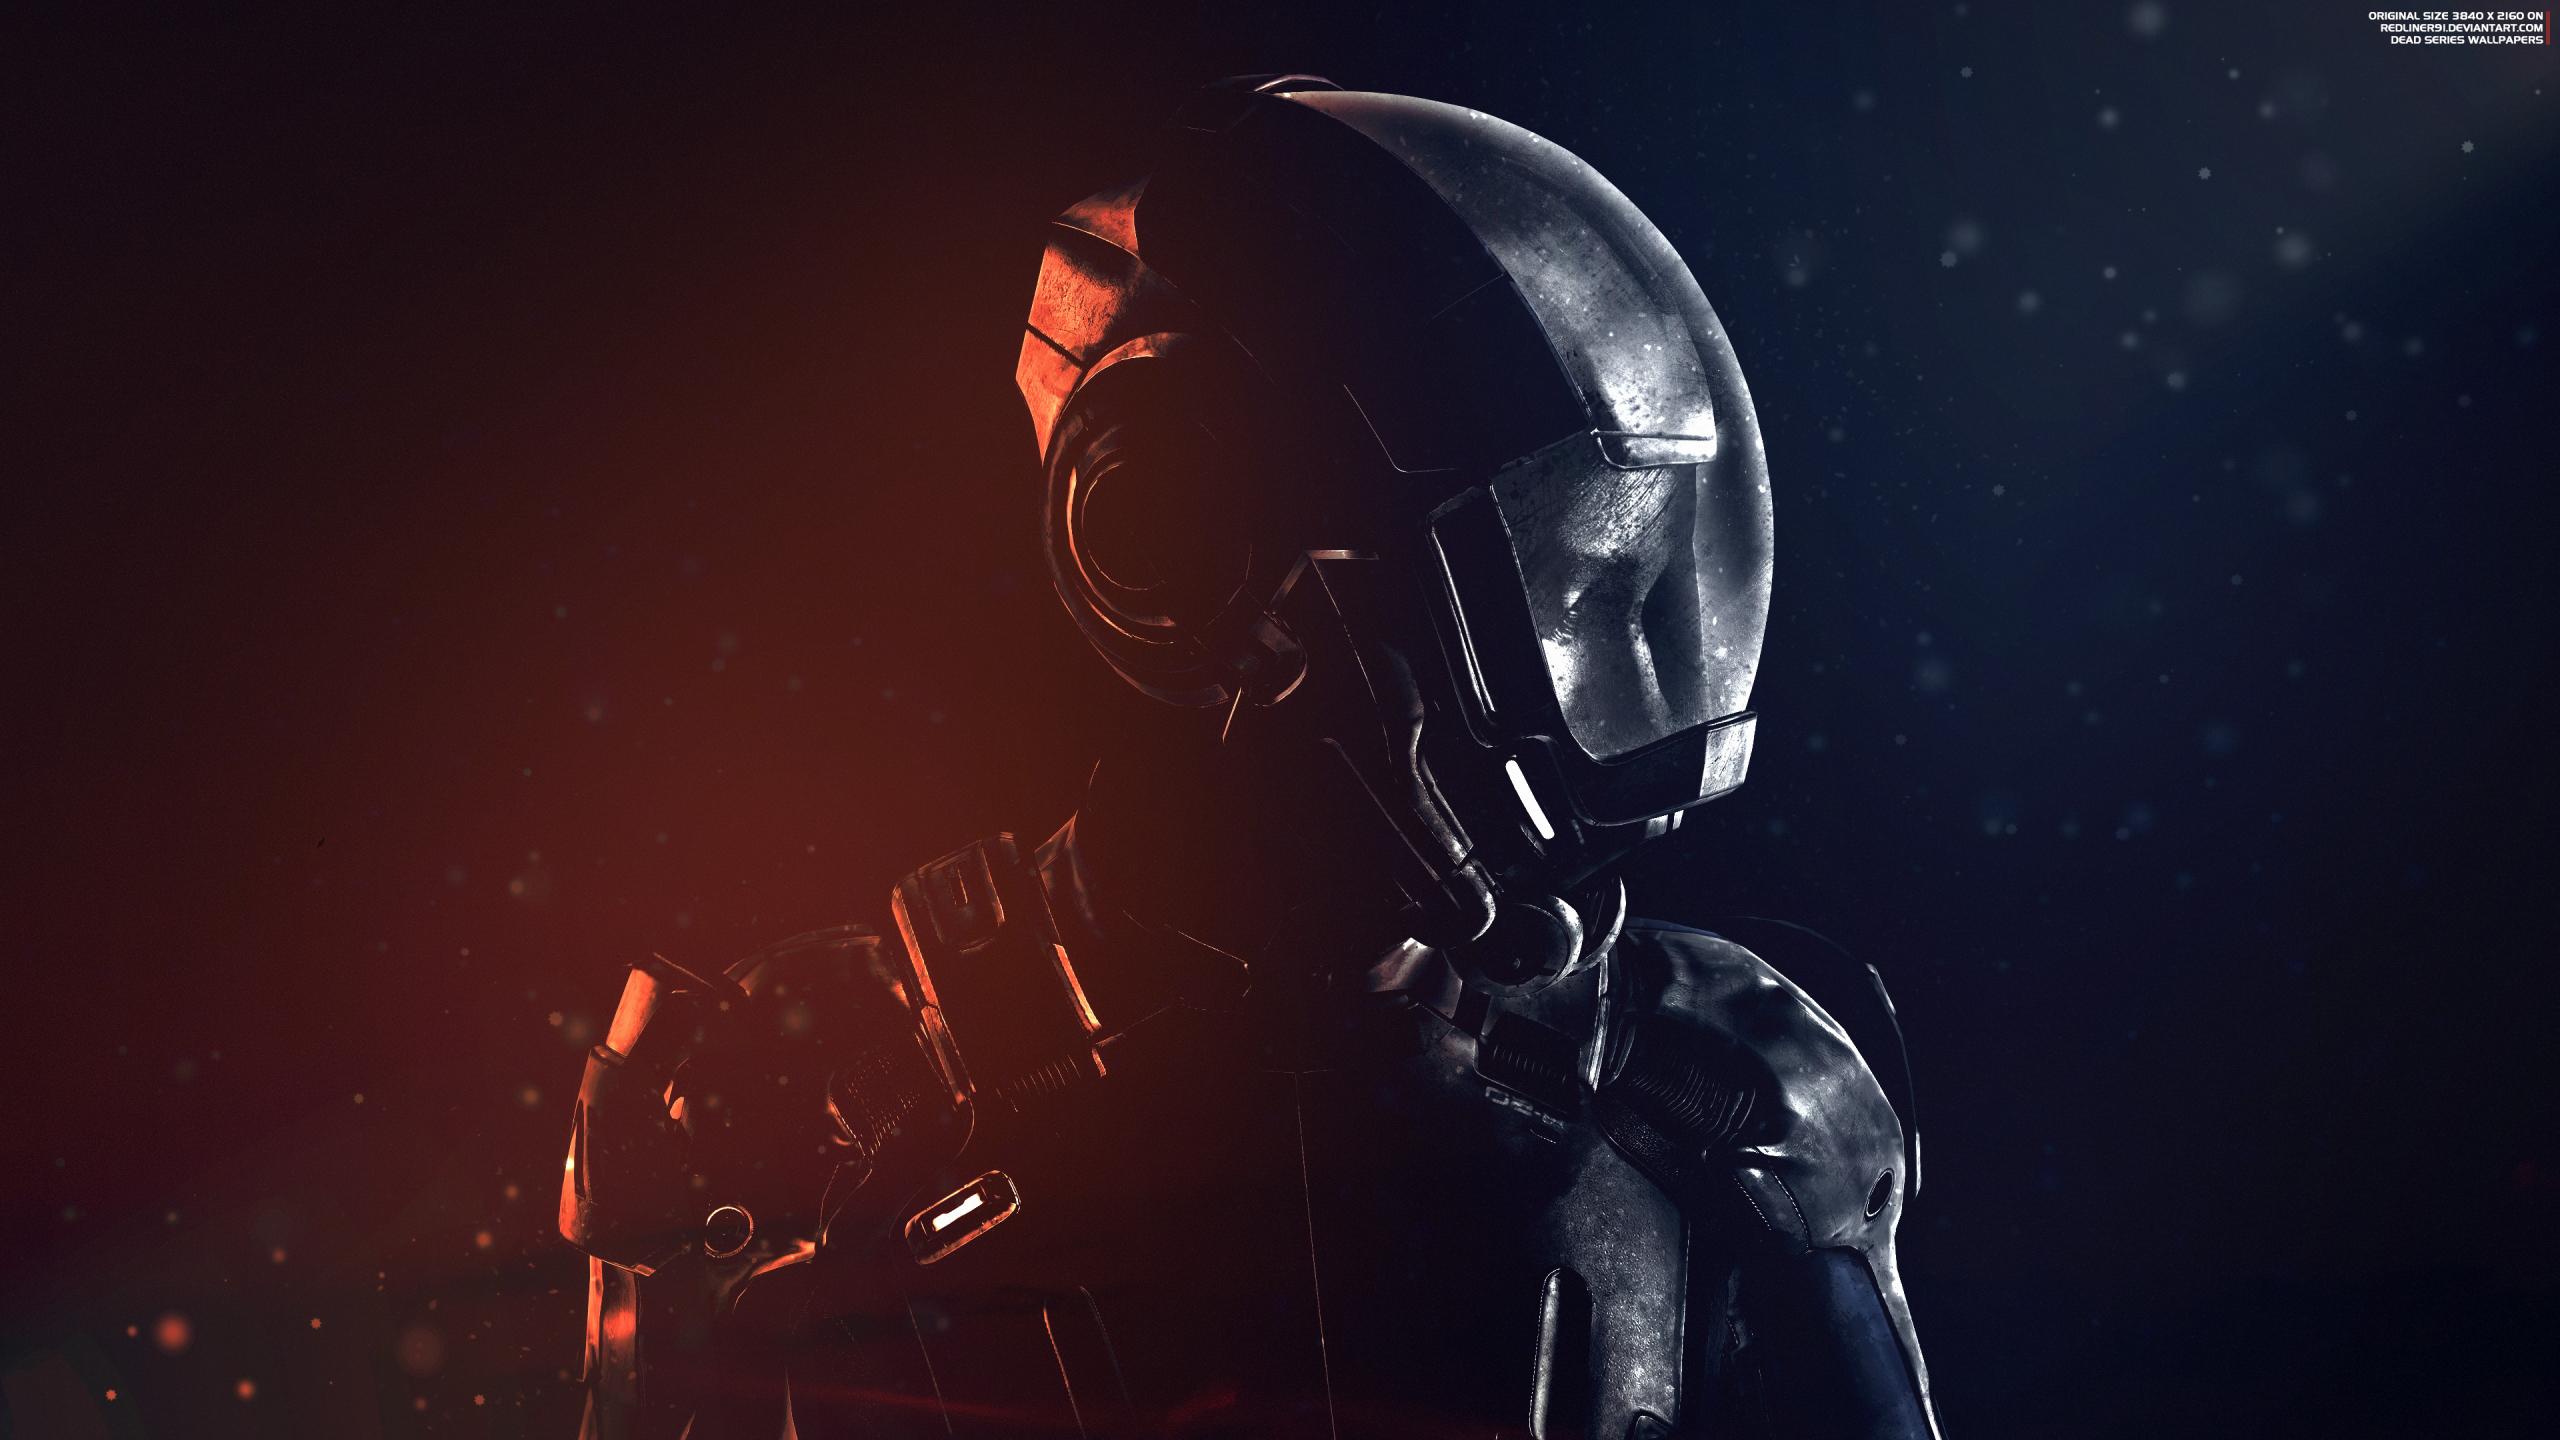 2560x1440 2017 Mass Effect Andromeda Fanart 1440p Resolution